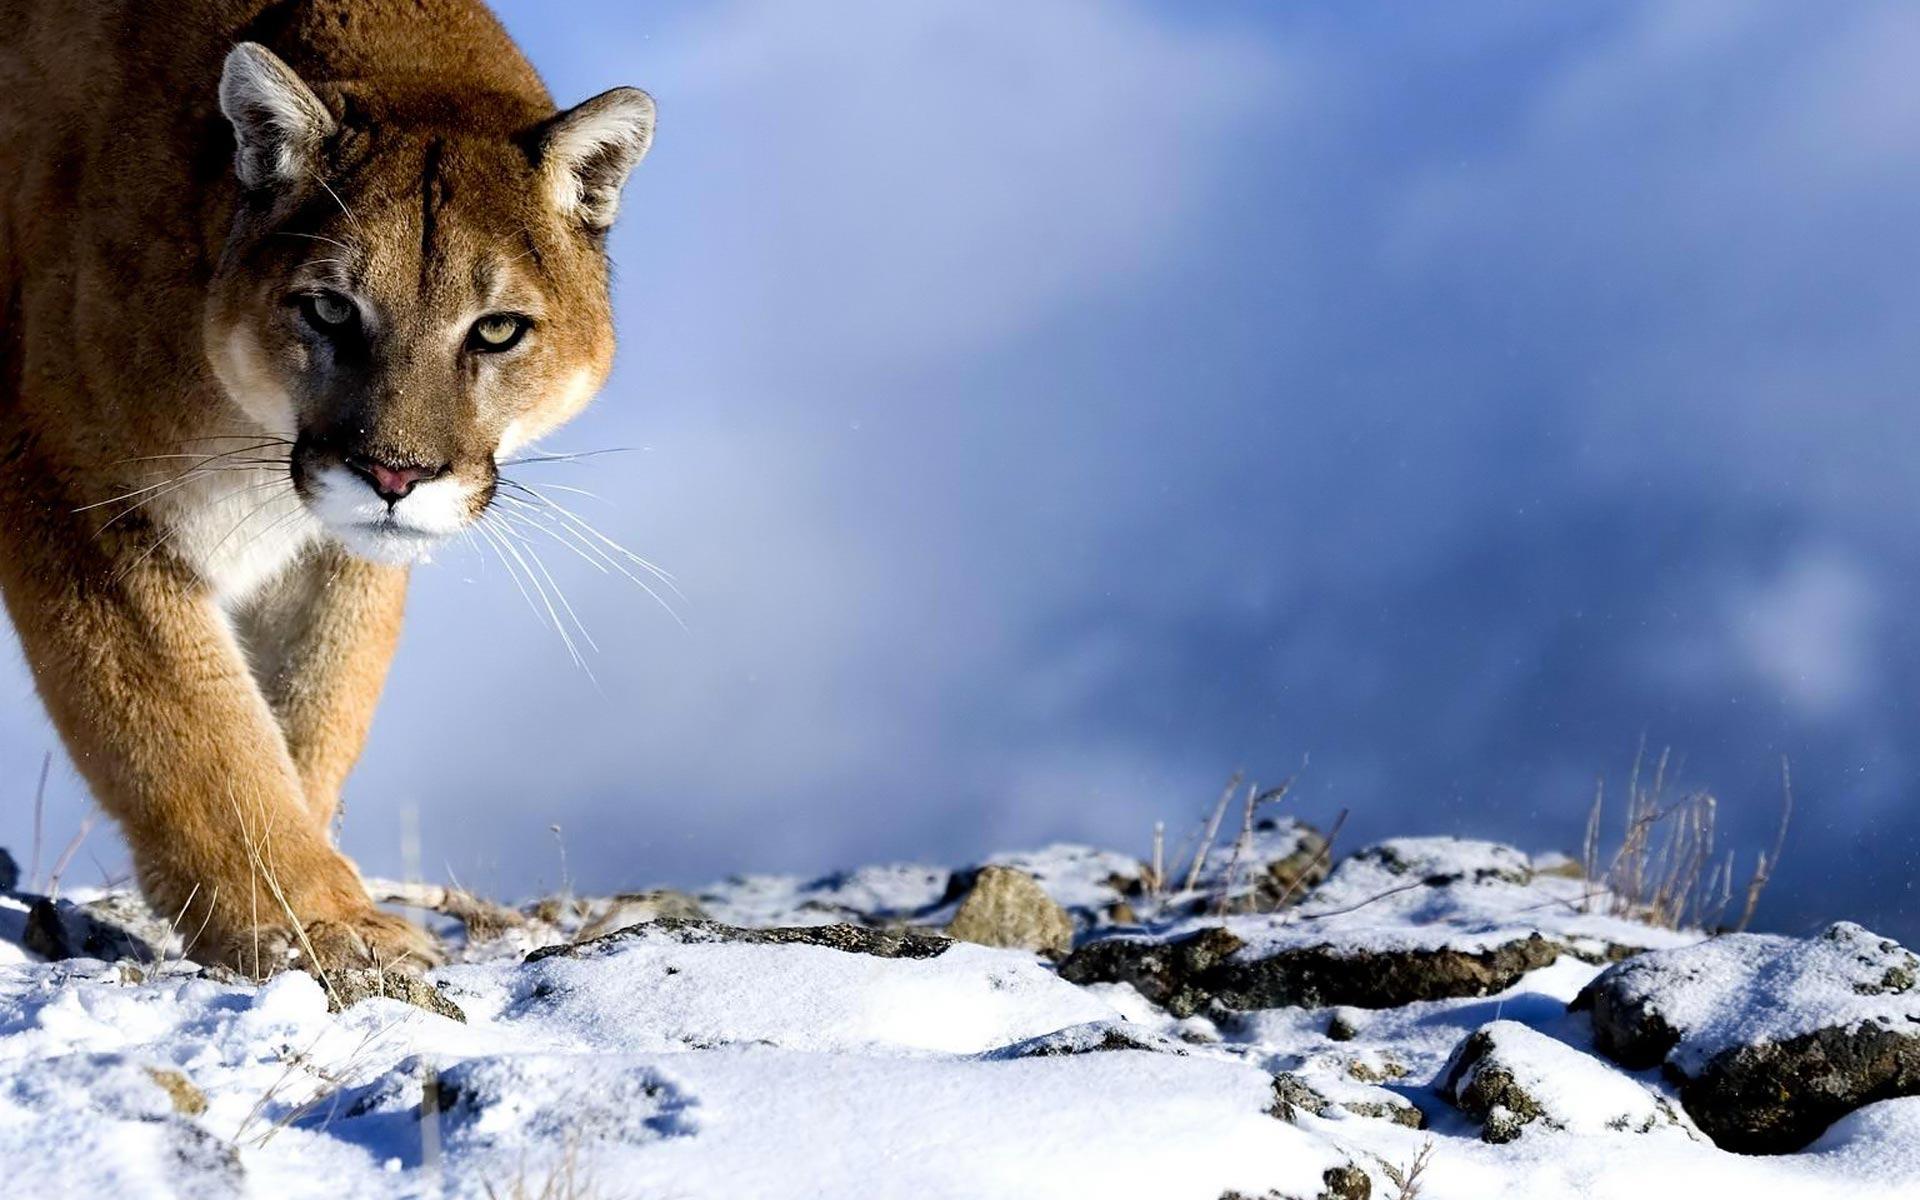 Fall Baby Animal Wallpaper Free Download Cougar Wallpapers Hd Pixelstalk Net